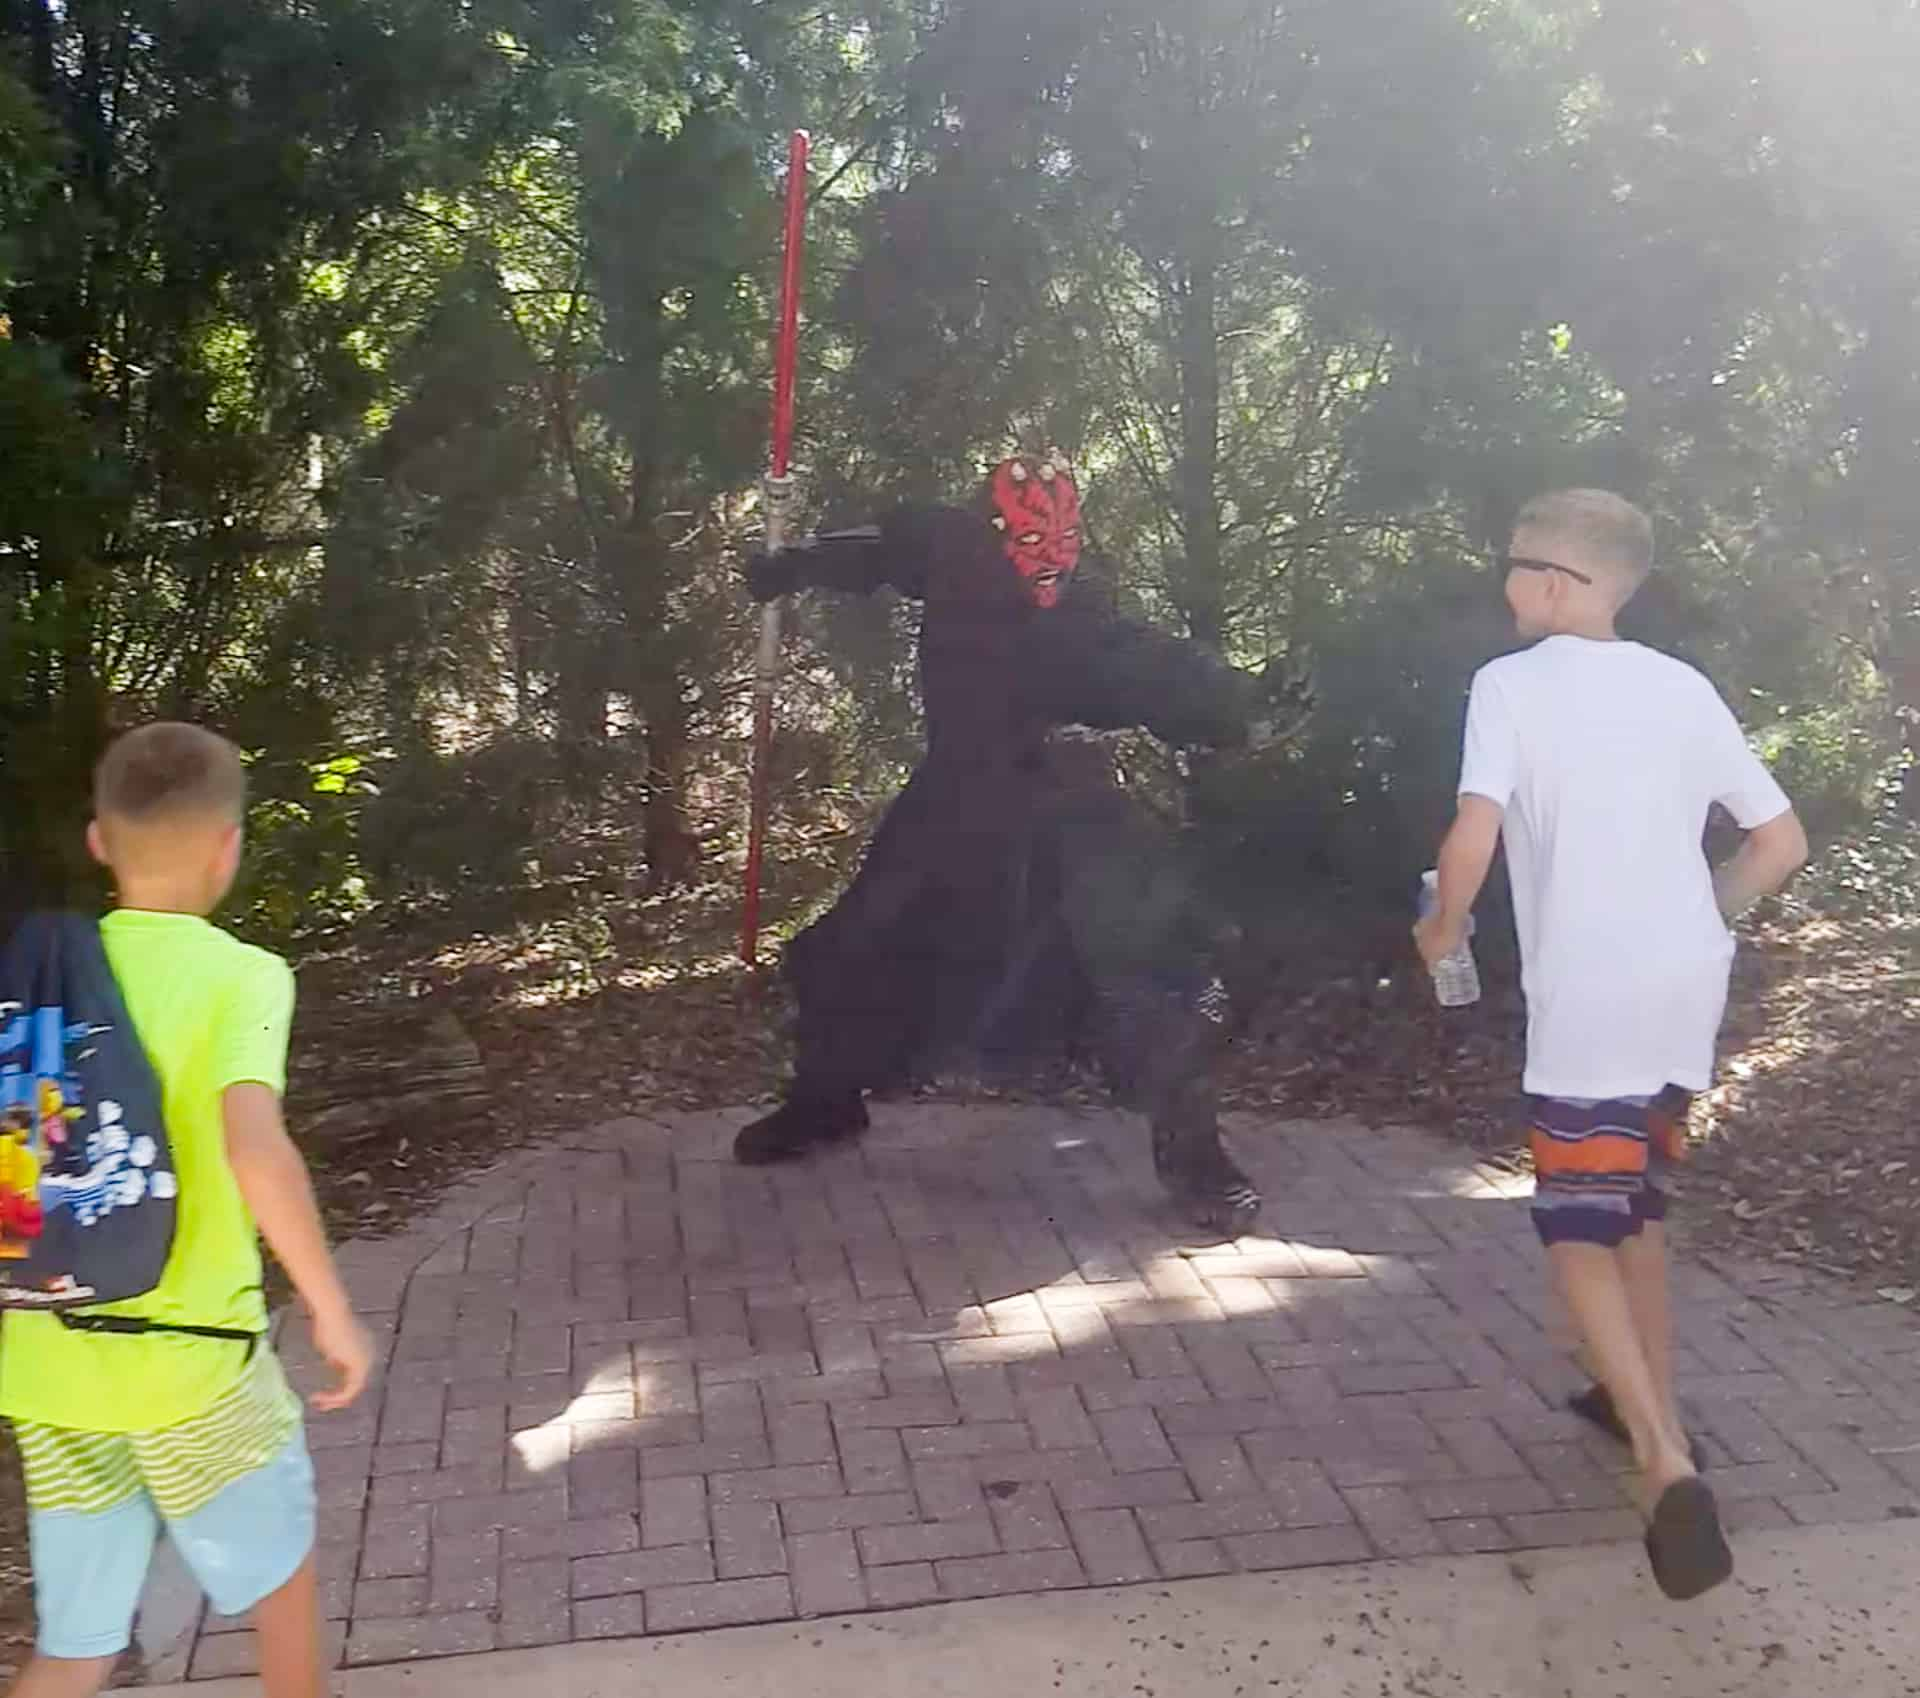 Legoland Florida Star Wars Darth Maul sculpture